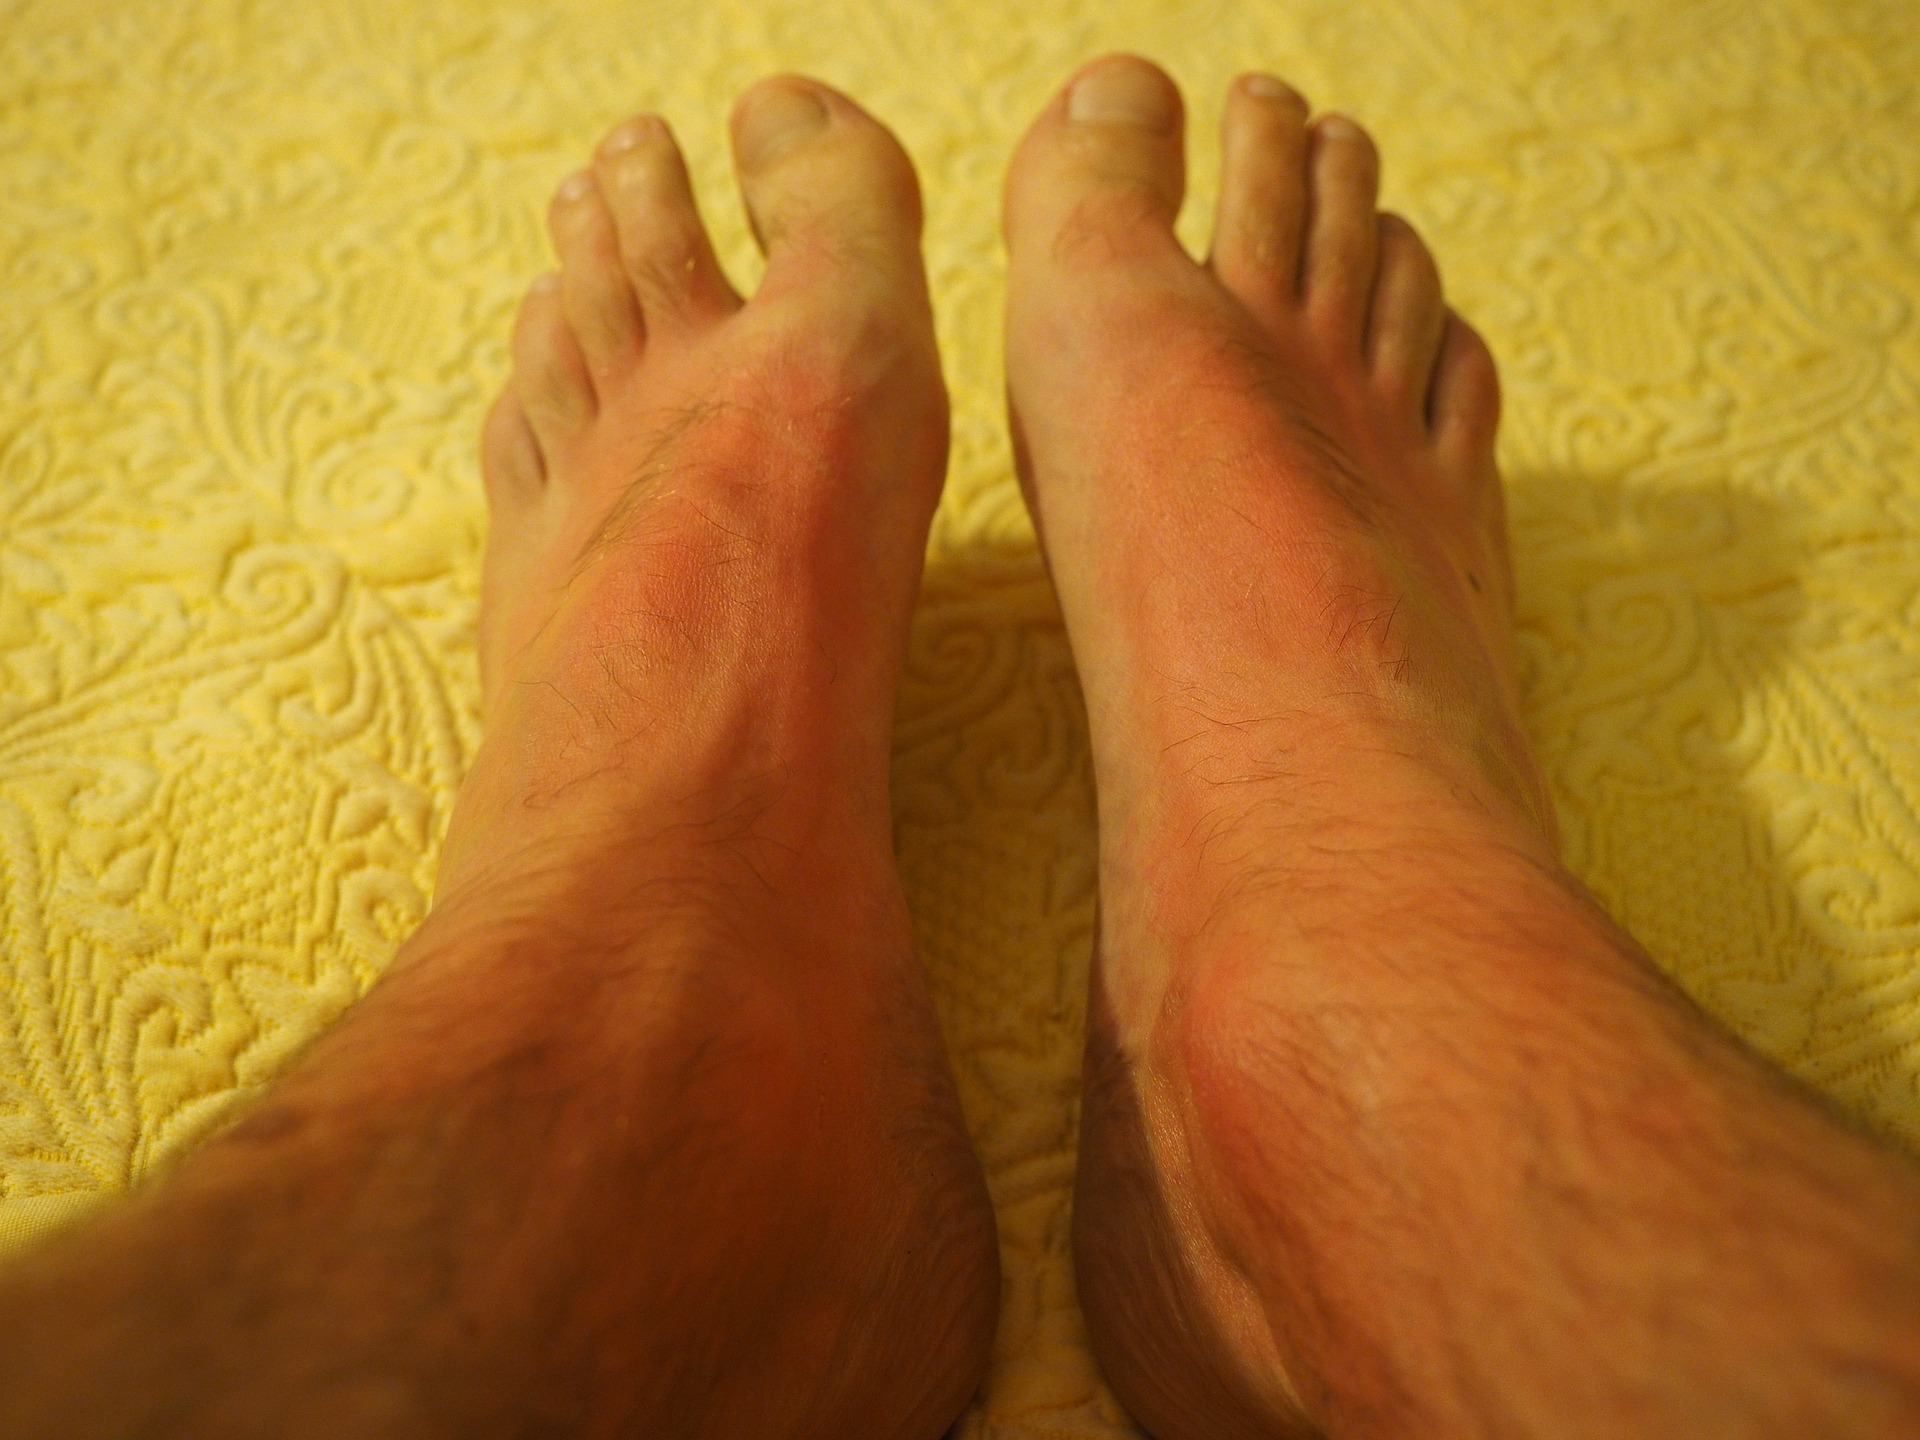 sunburned feet